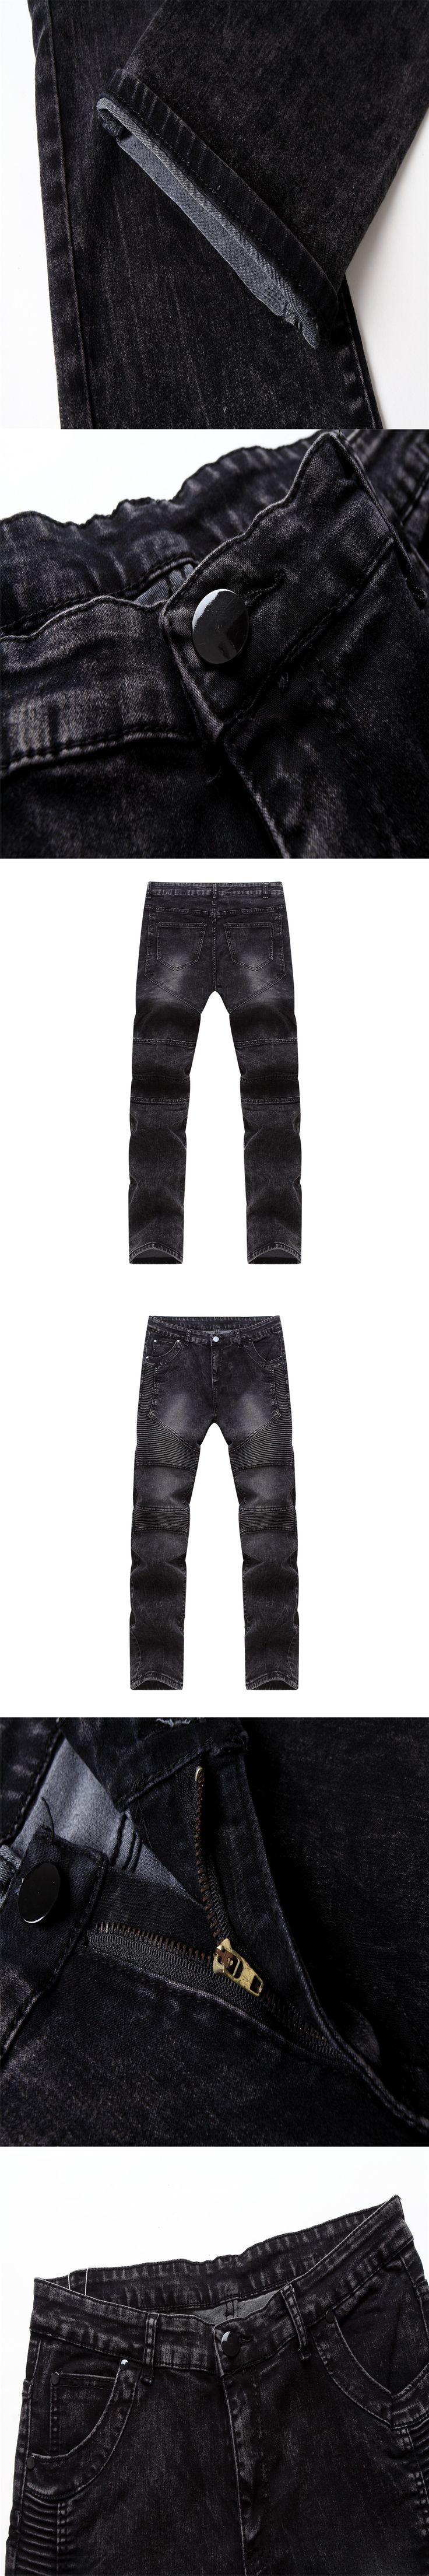 Hot Summer Motor Jeans Men Fear of God Biker Jeans Cotton Trousers Mens Hip Hop Robin Ripped Jeans Mans Skate Slim Fitness Pants